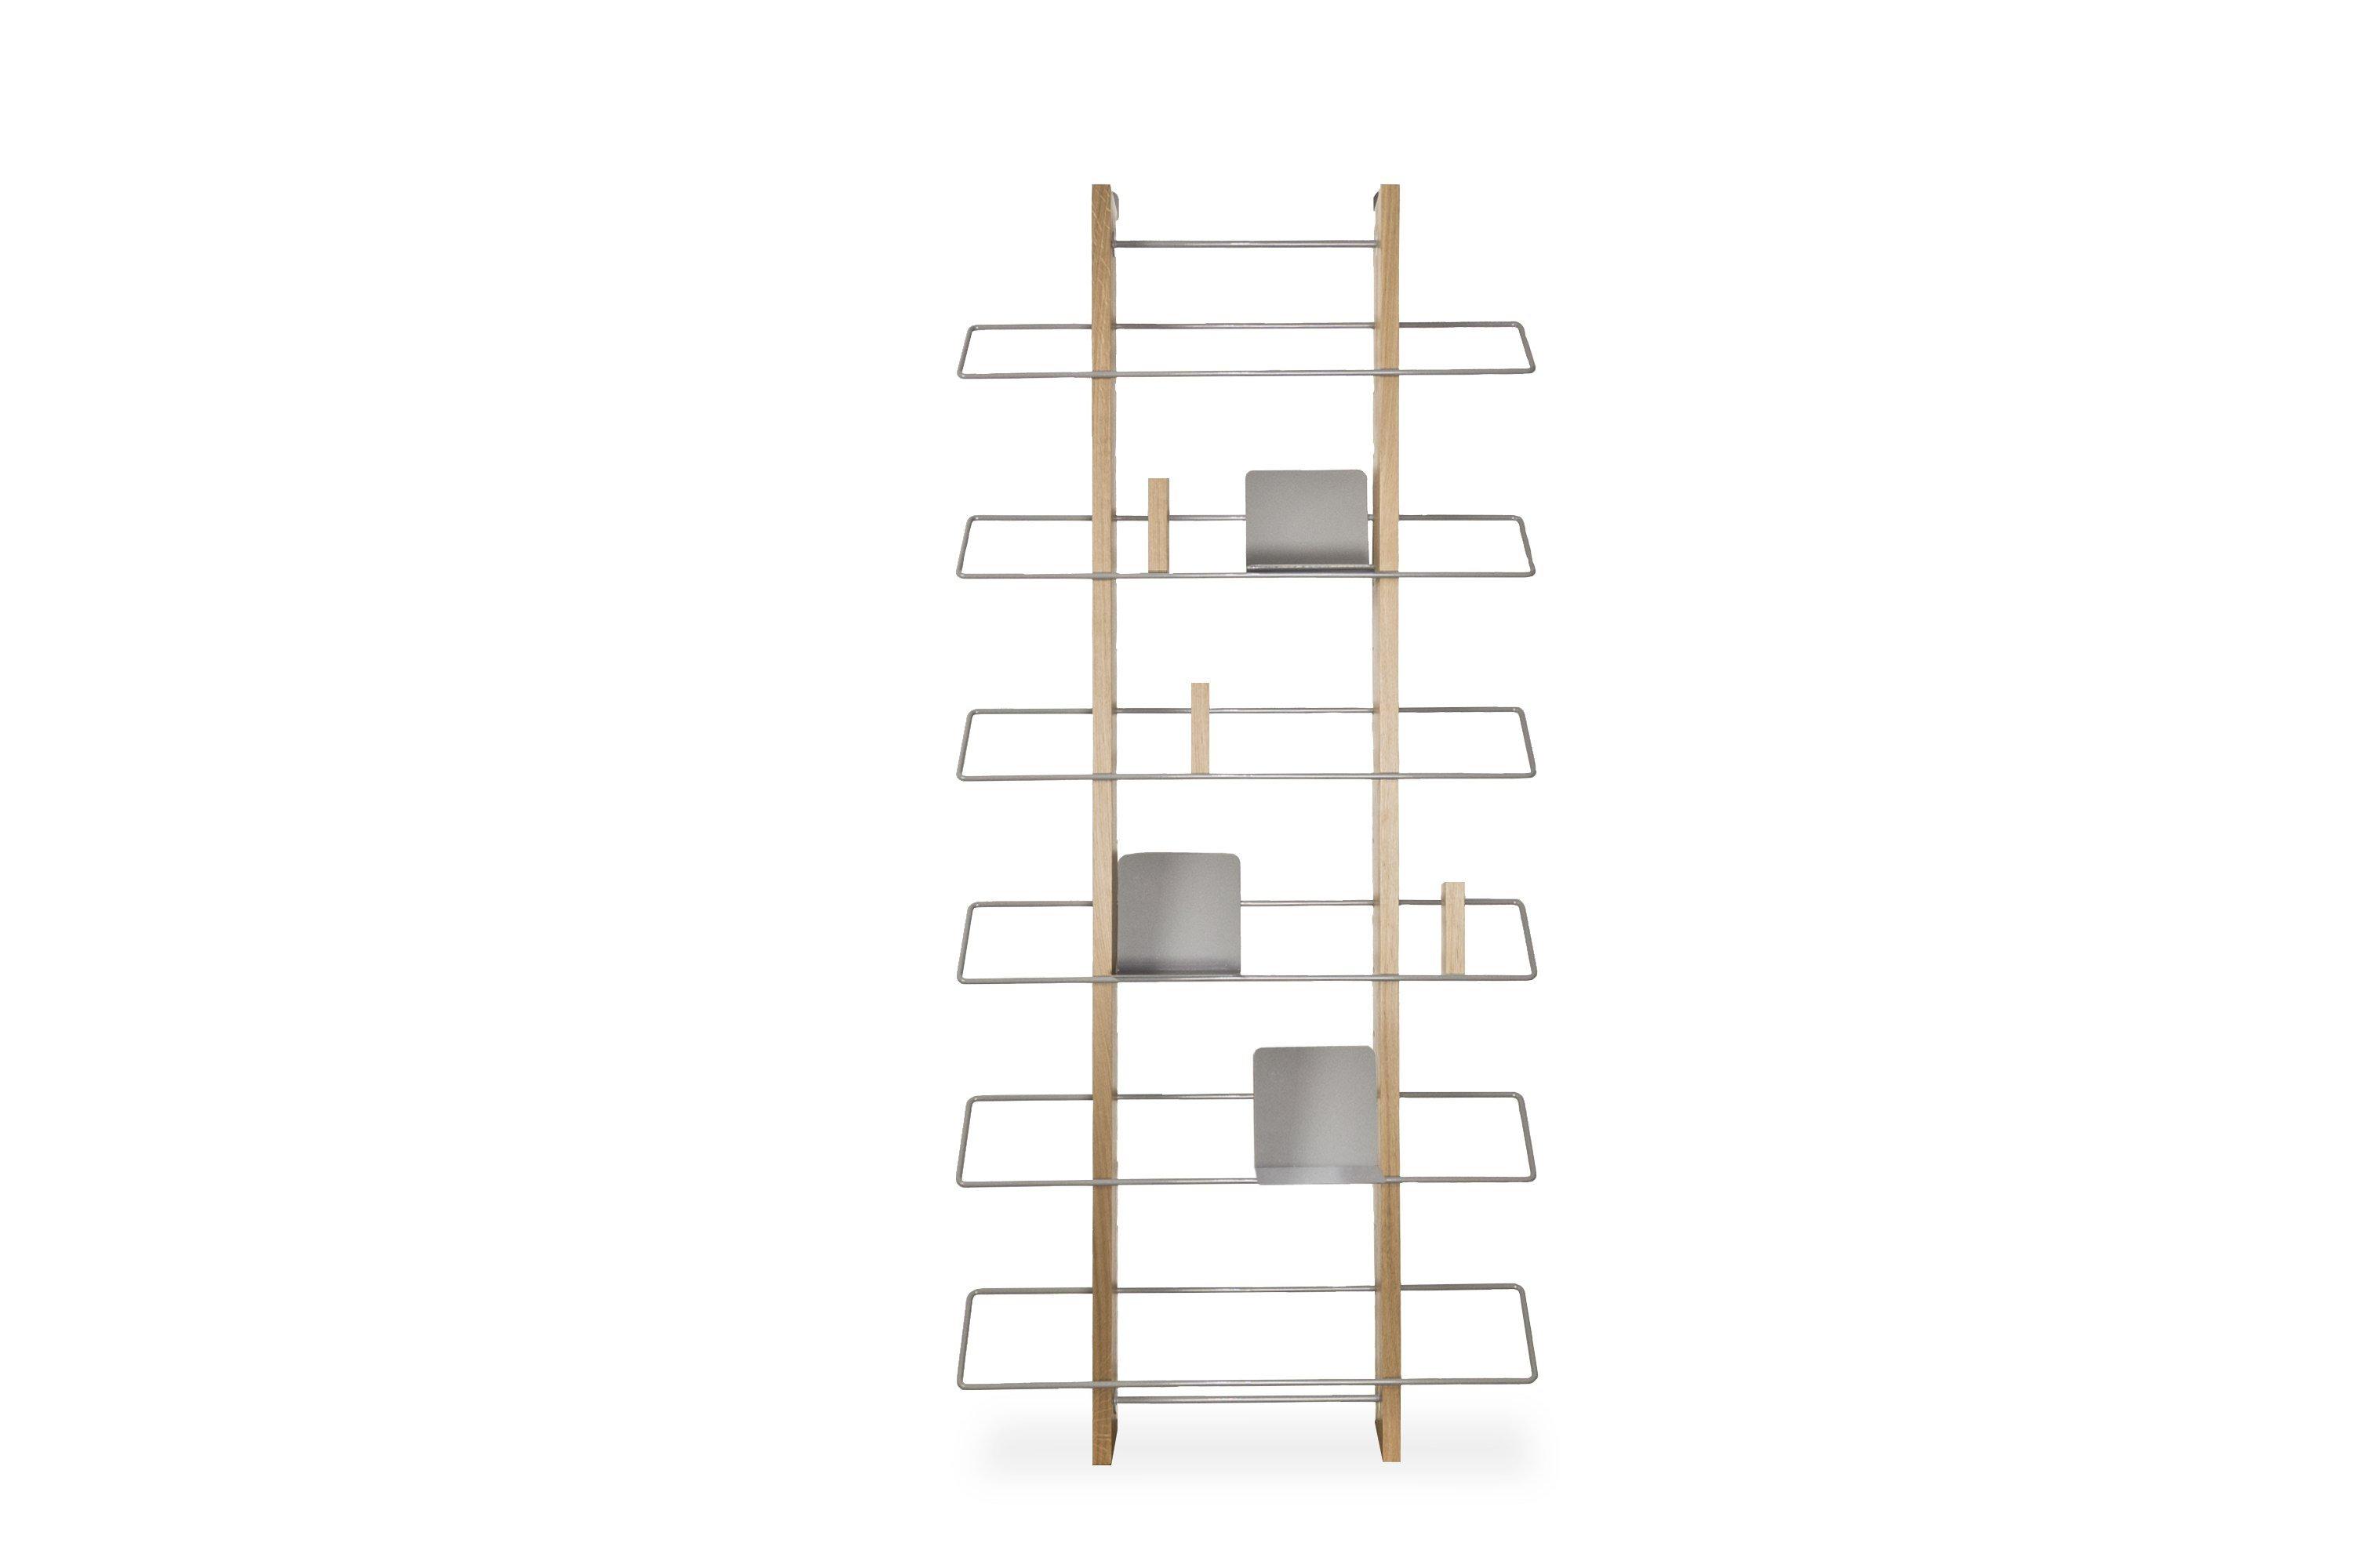 Grapevine Wooden Wall Bookshelf - Platinum Grey - merk: Edizione Limitata